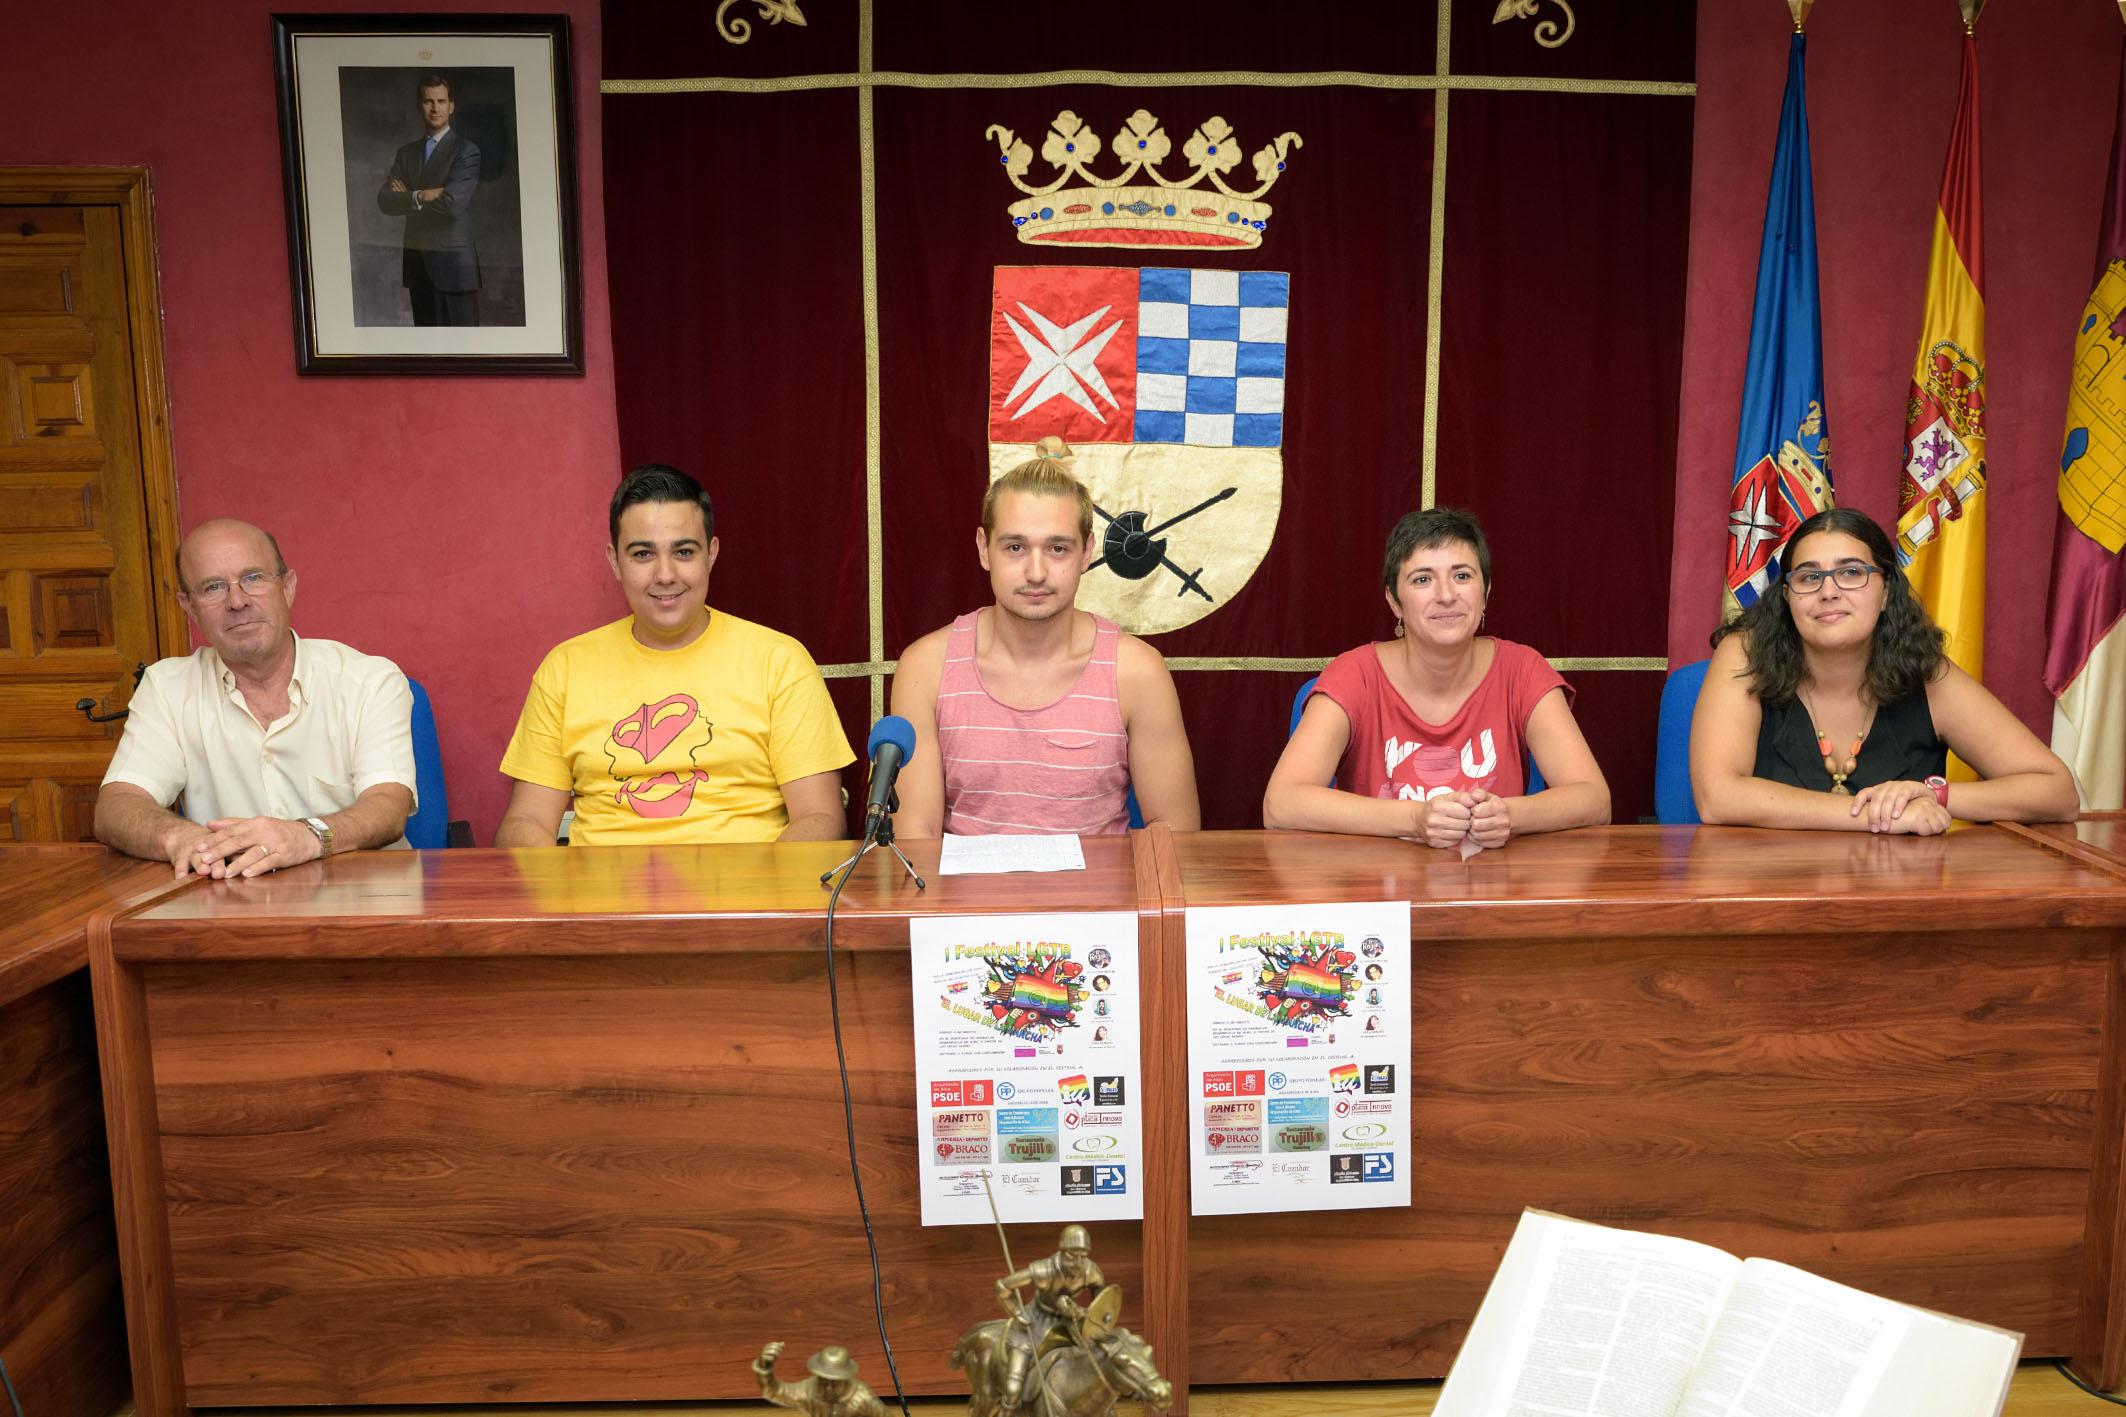 Presentación del I Festival LGTB de Argamasilla de Alba